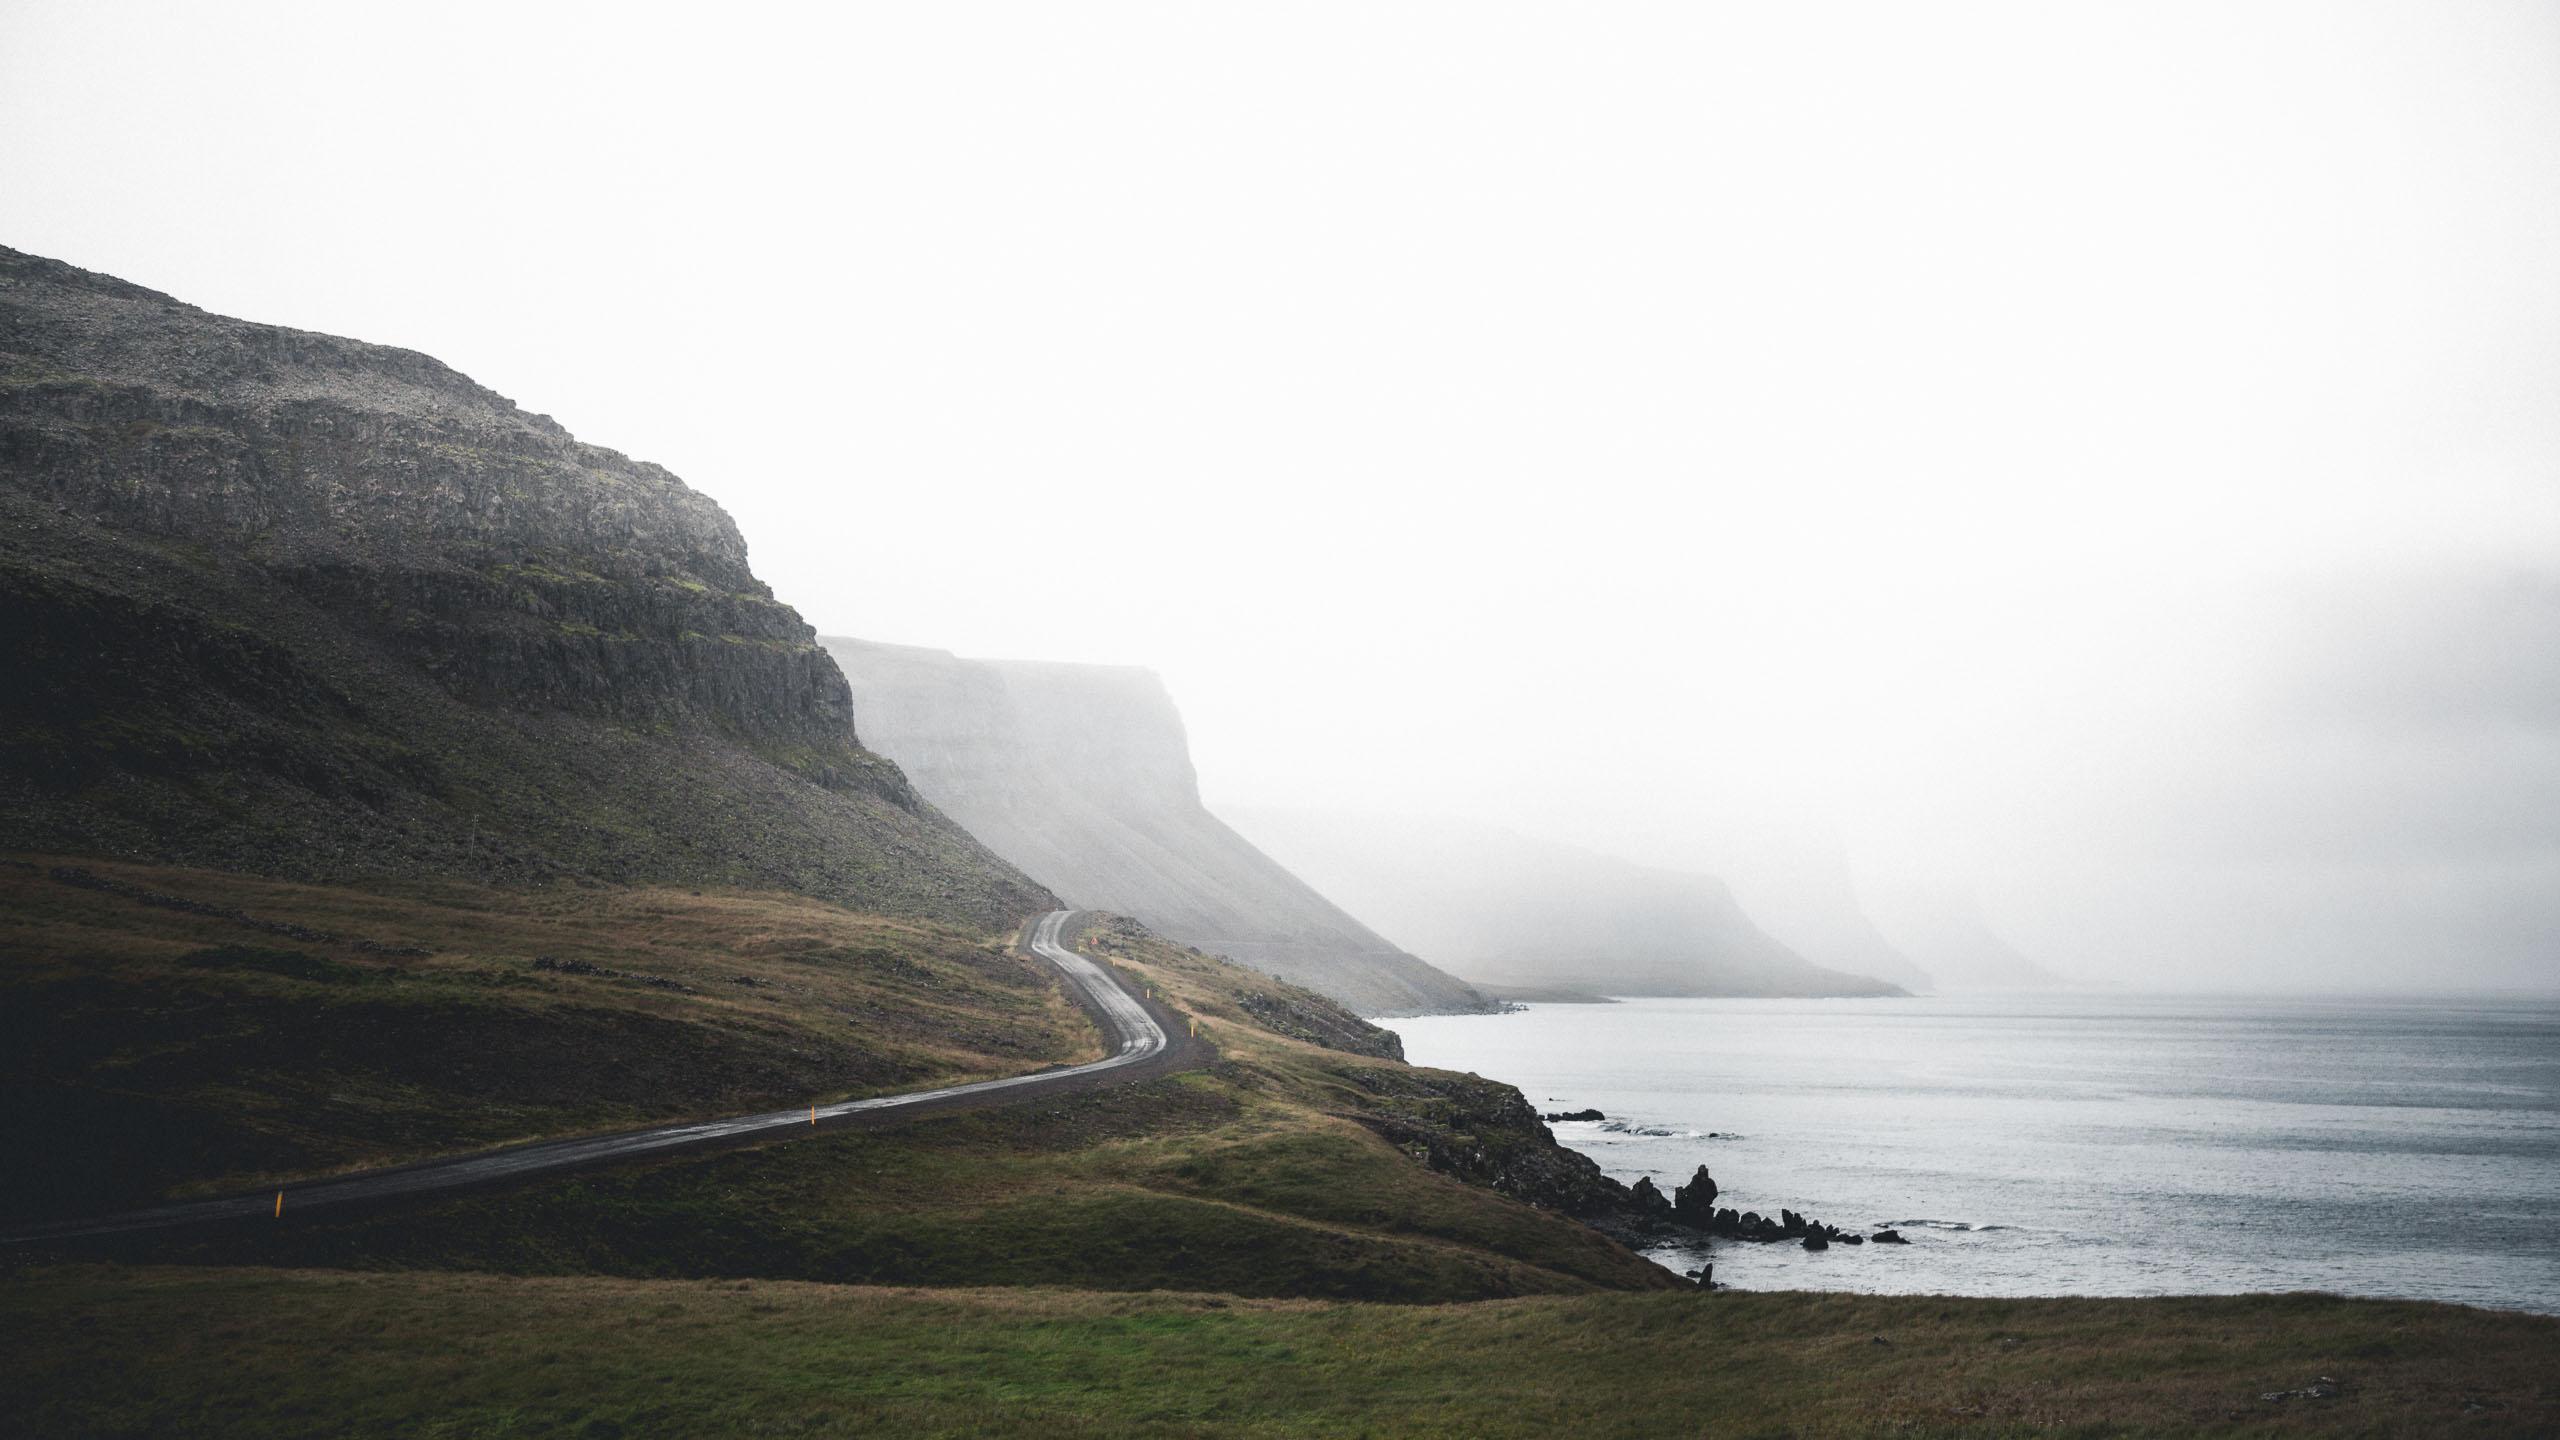 Westfjords of Iceland | Hidden Iceland | Photo by Norris Niman